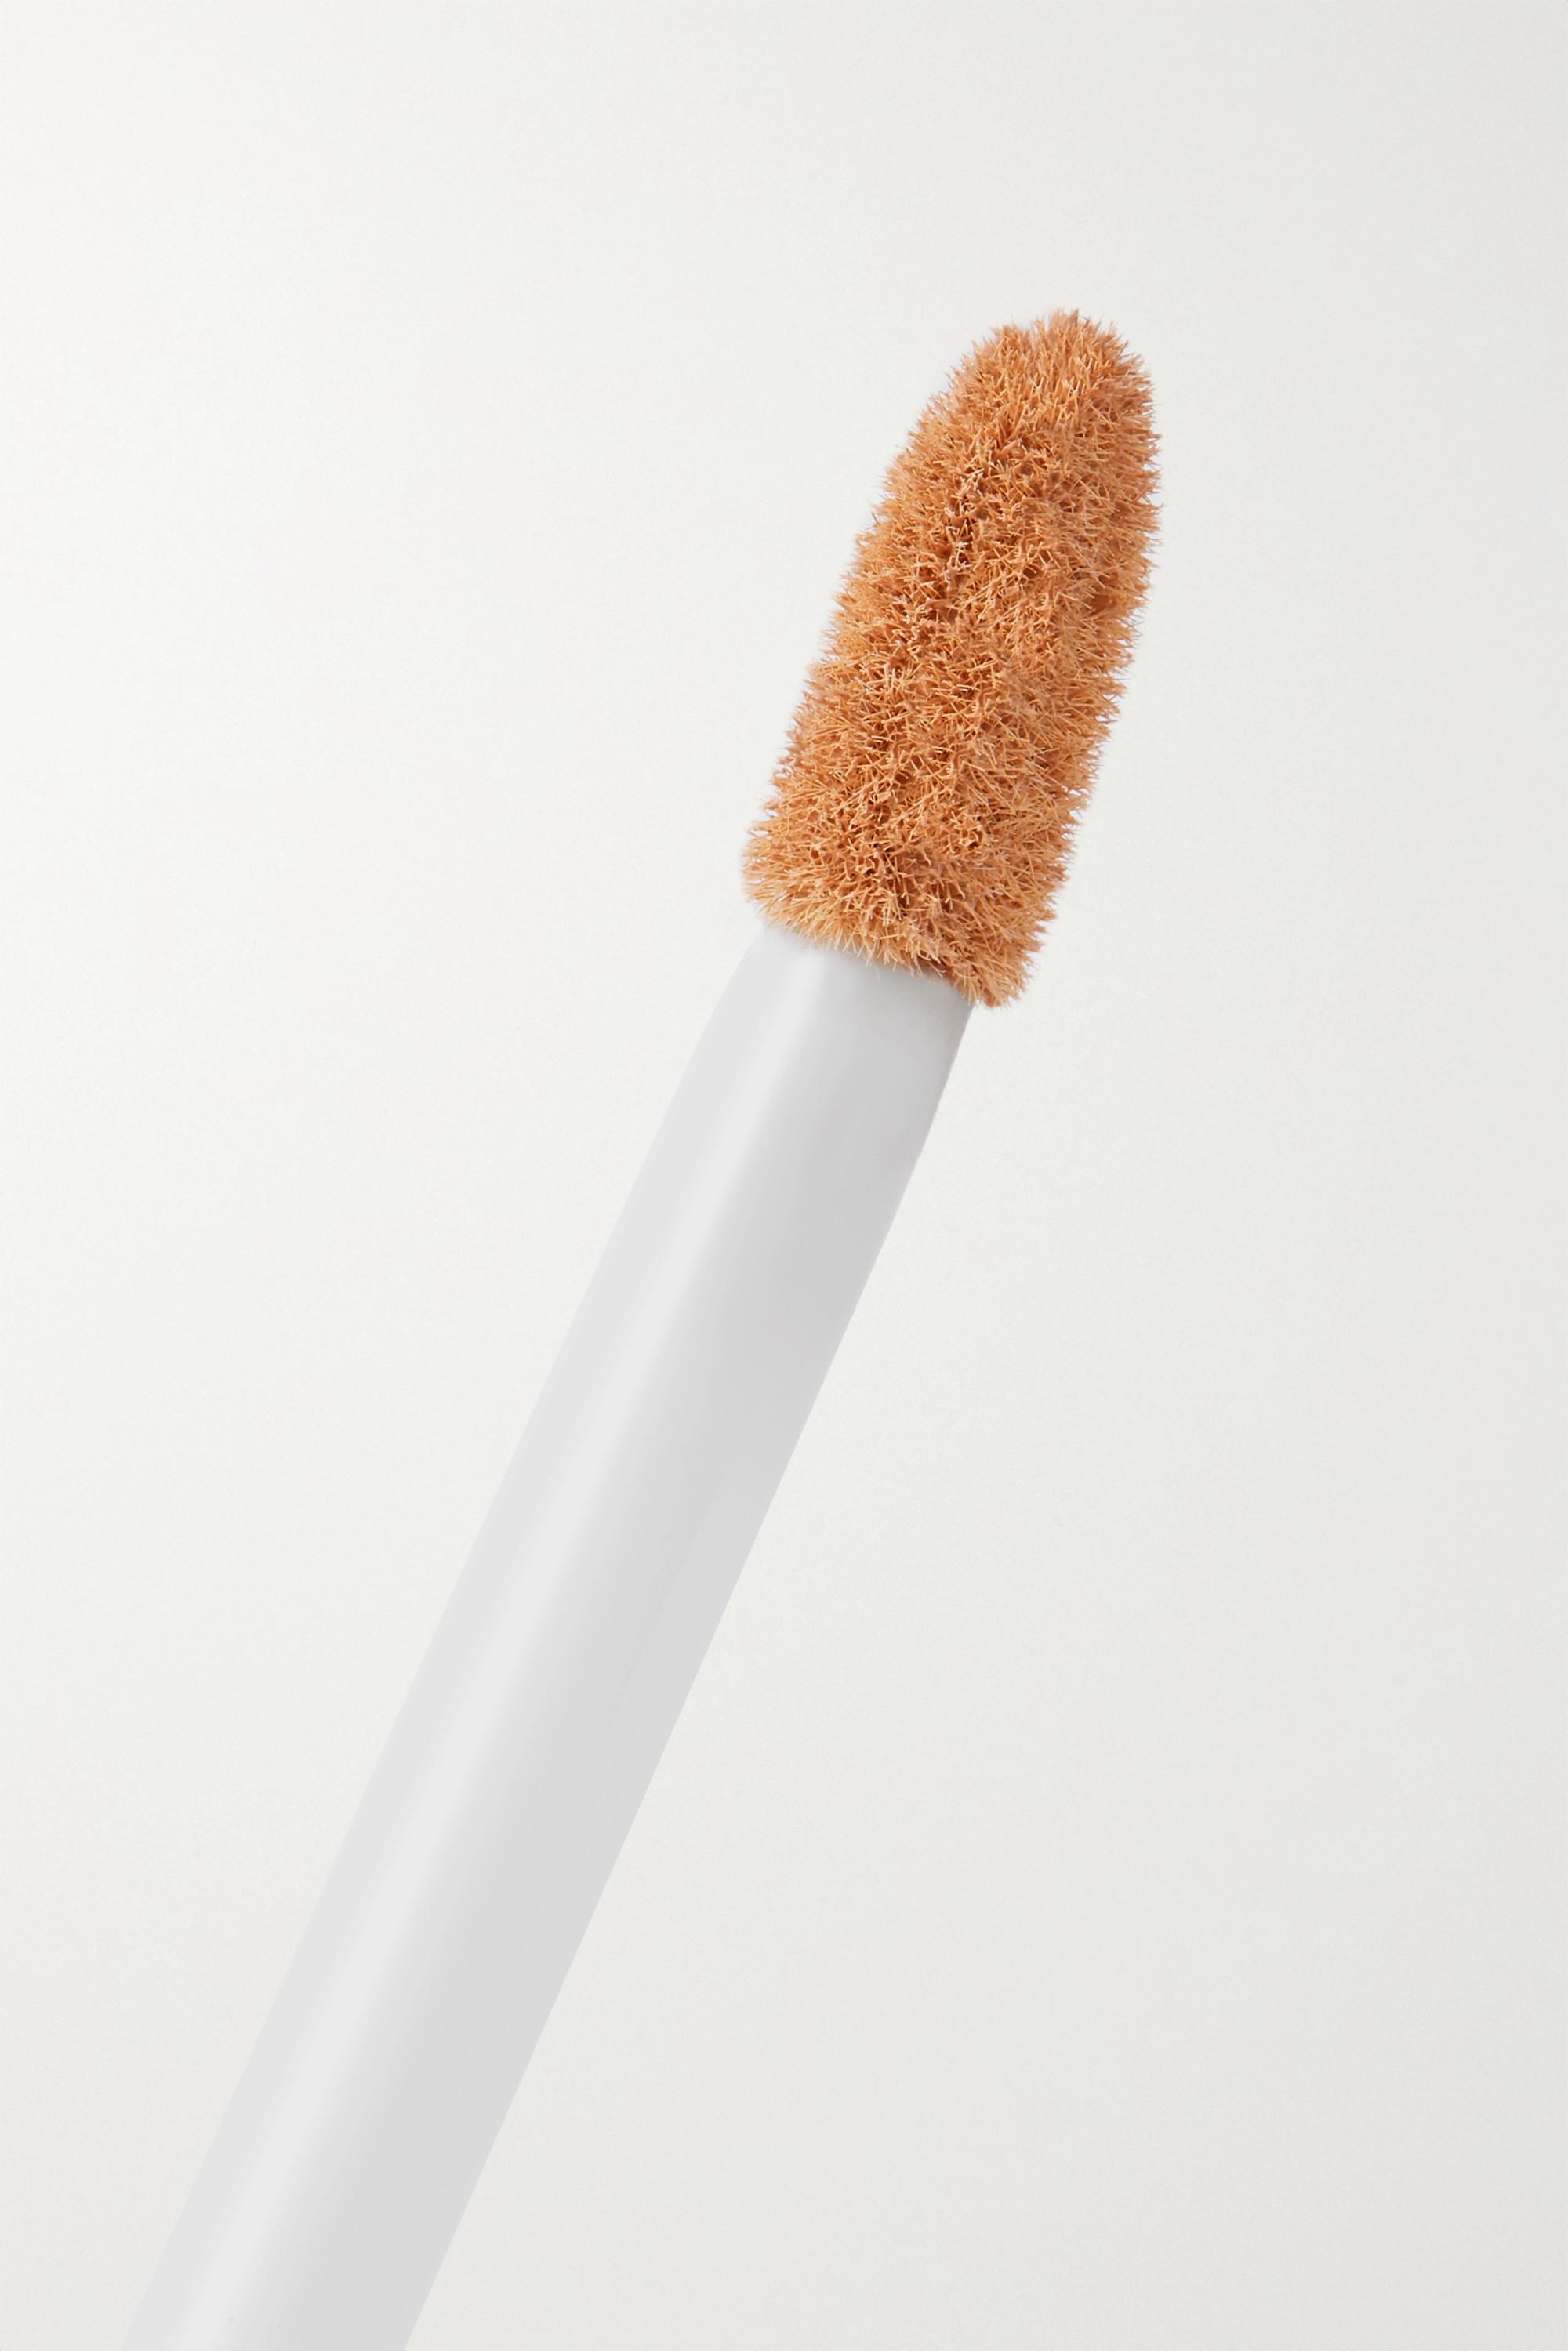 Pat McGrath Labs Skin Fetish: Sublime Perfection Concealer - M16, 5ml